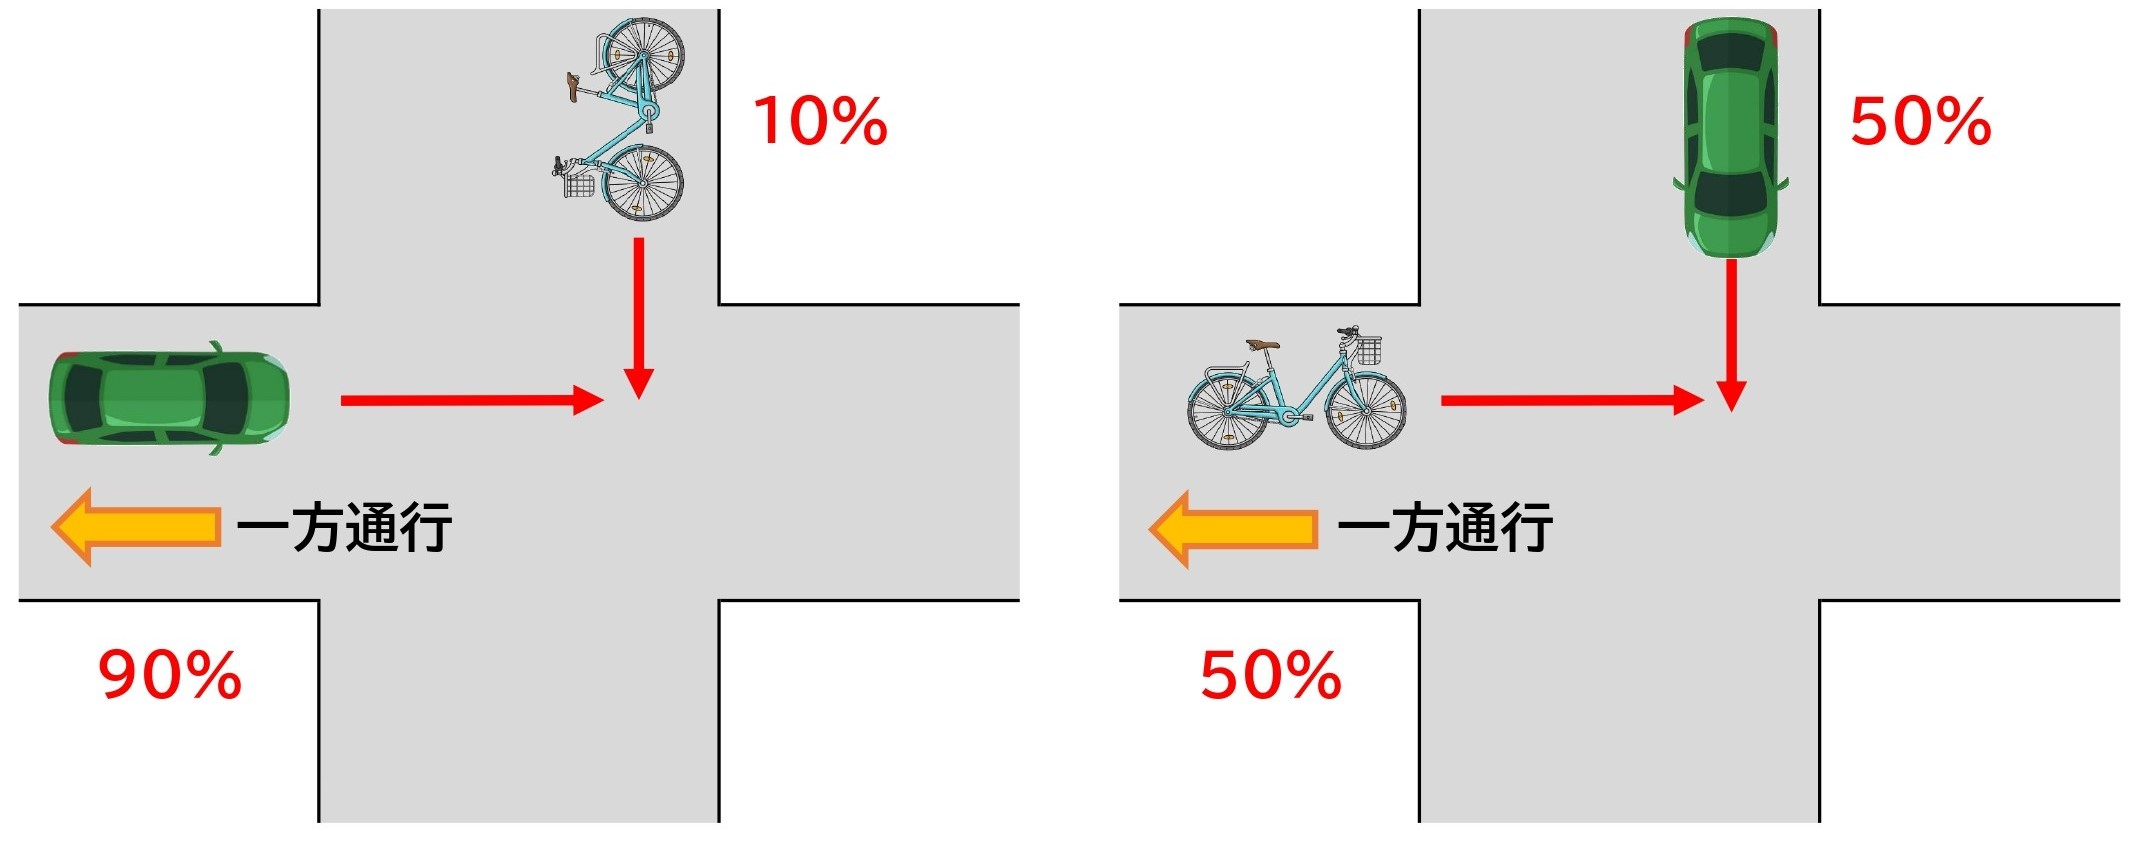 【図】自転車と車/交差点/直進同士/信号なし/一方通行違反